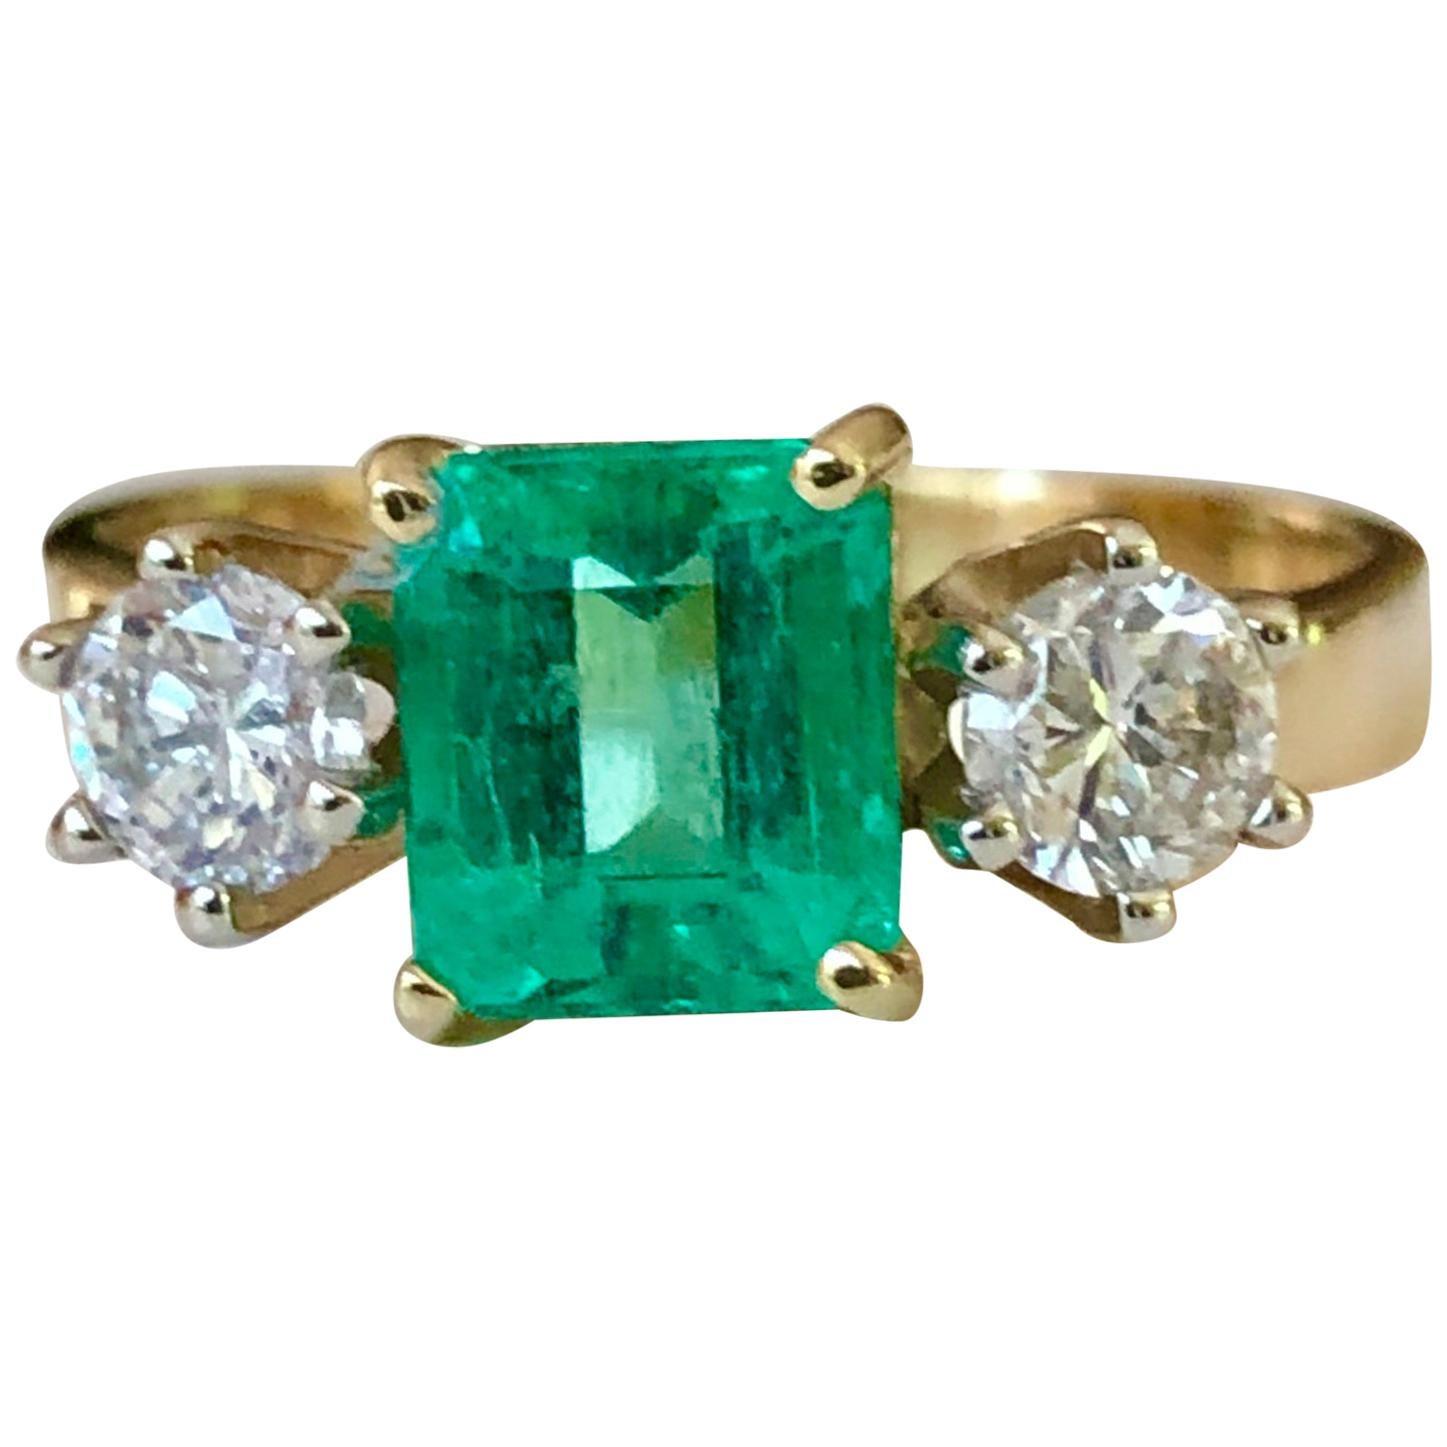 1.83 Carat Natural Colombian Emerald and Diamond Three-Stone Ring 18 Karat